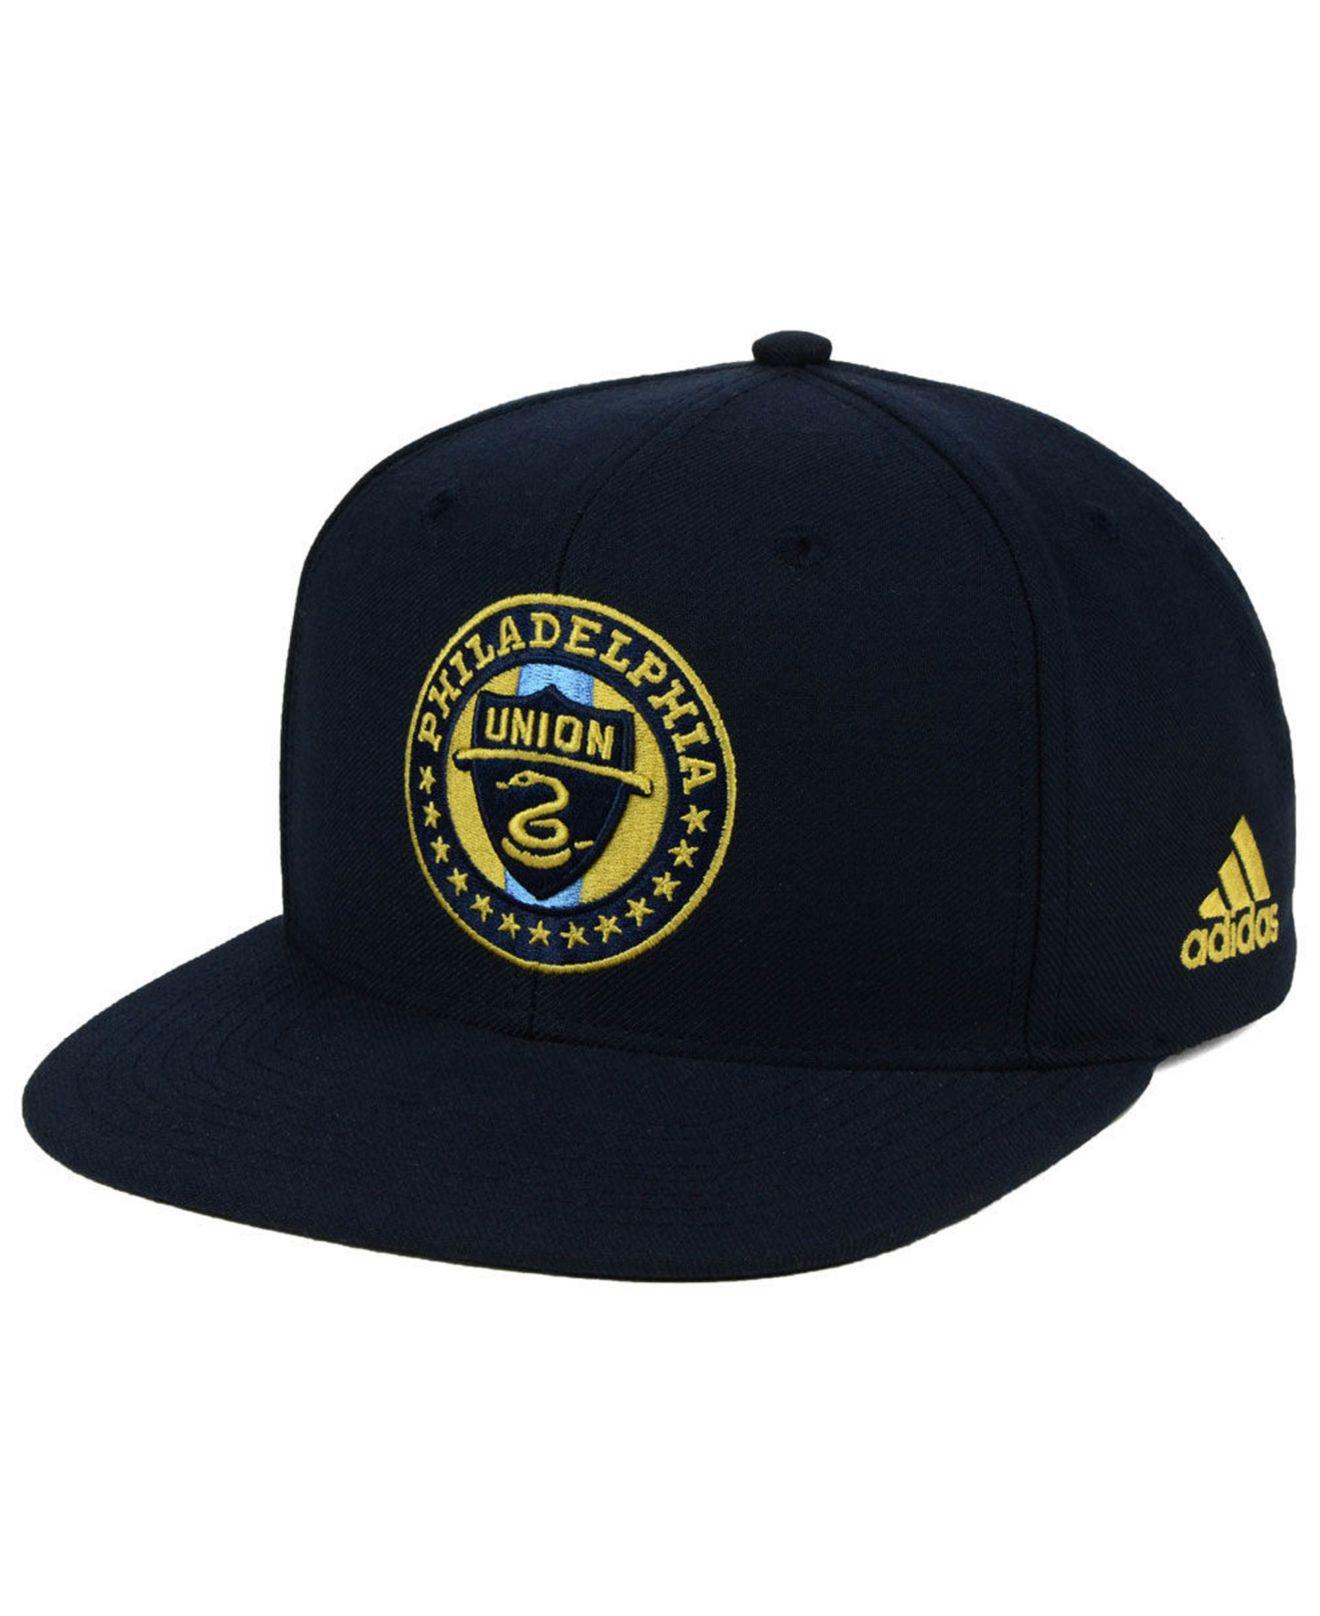 Lyst - Adidas Philadelphia Union Poly Snapback Cap in Blue for Men 798cc92a31f6